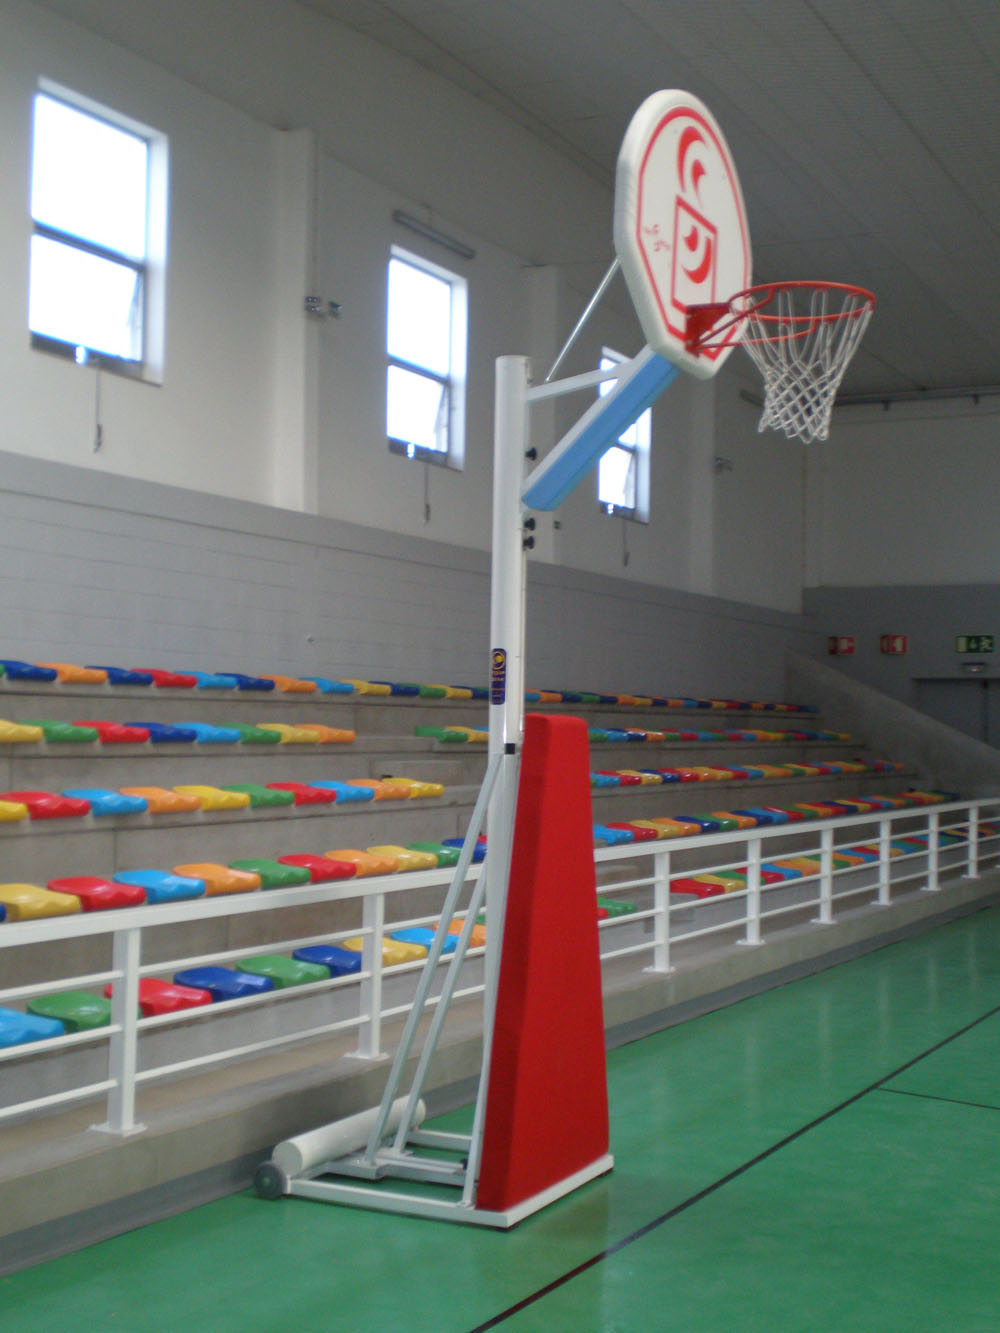 Escola EB 2/3 José Afonso - Alhos Vedros